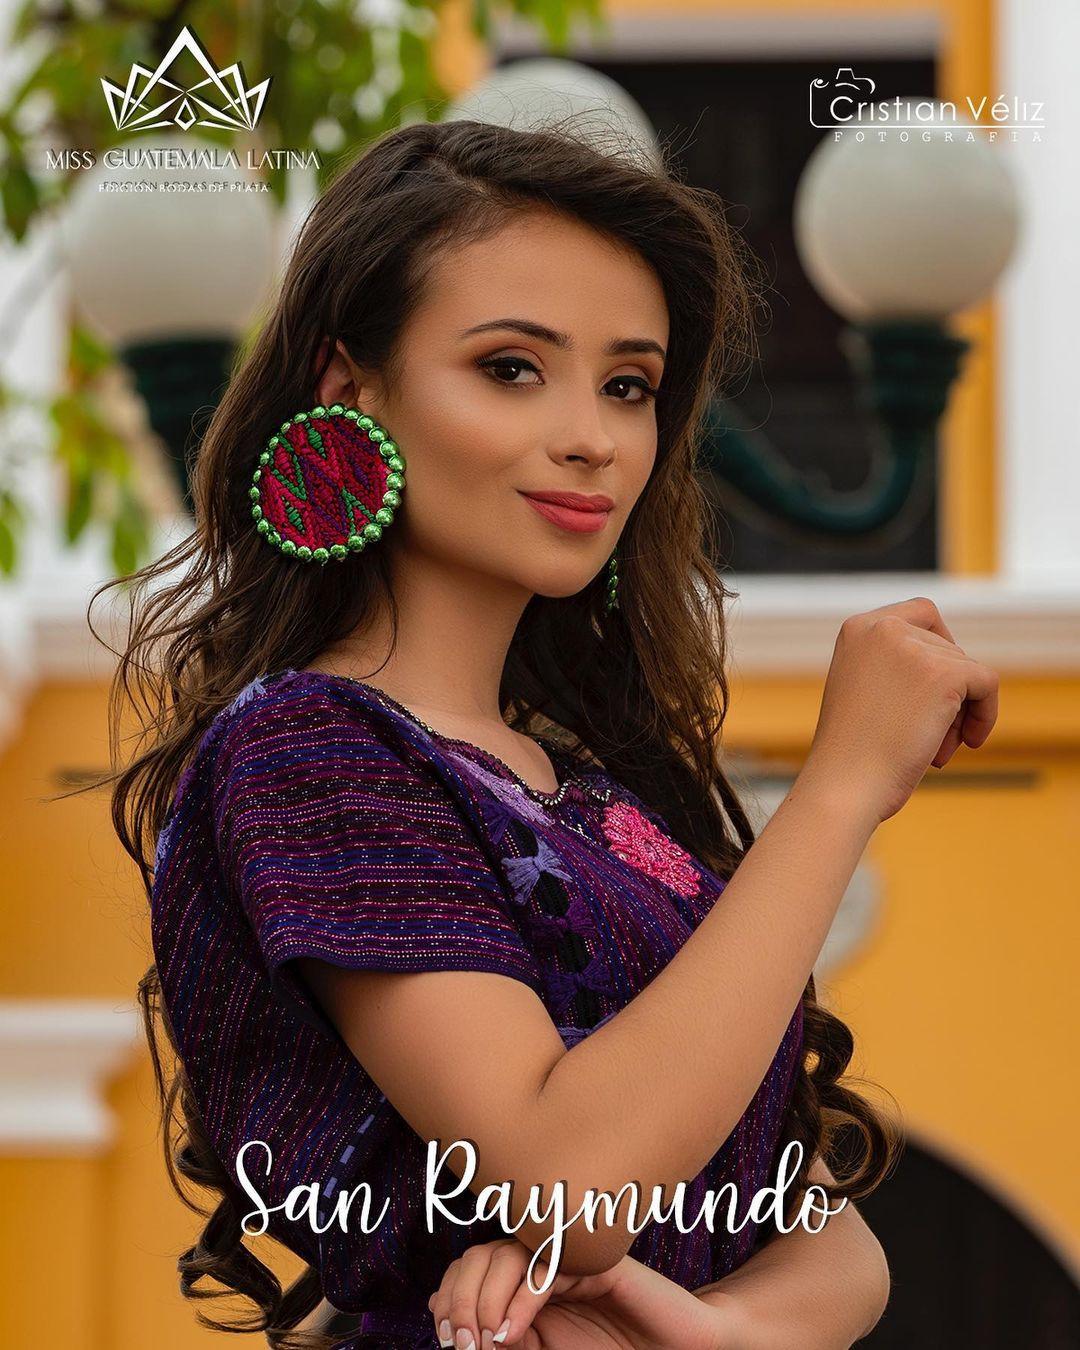 candidatas a miss guatemala latina 2021. final: 30 de abril. - Página 3 B2gypS